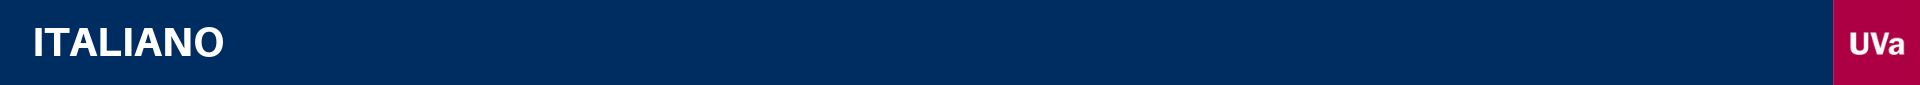 Italiano banner cursos web